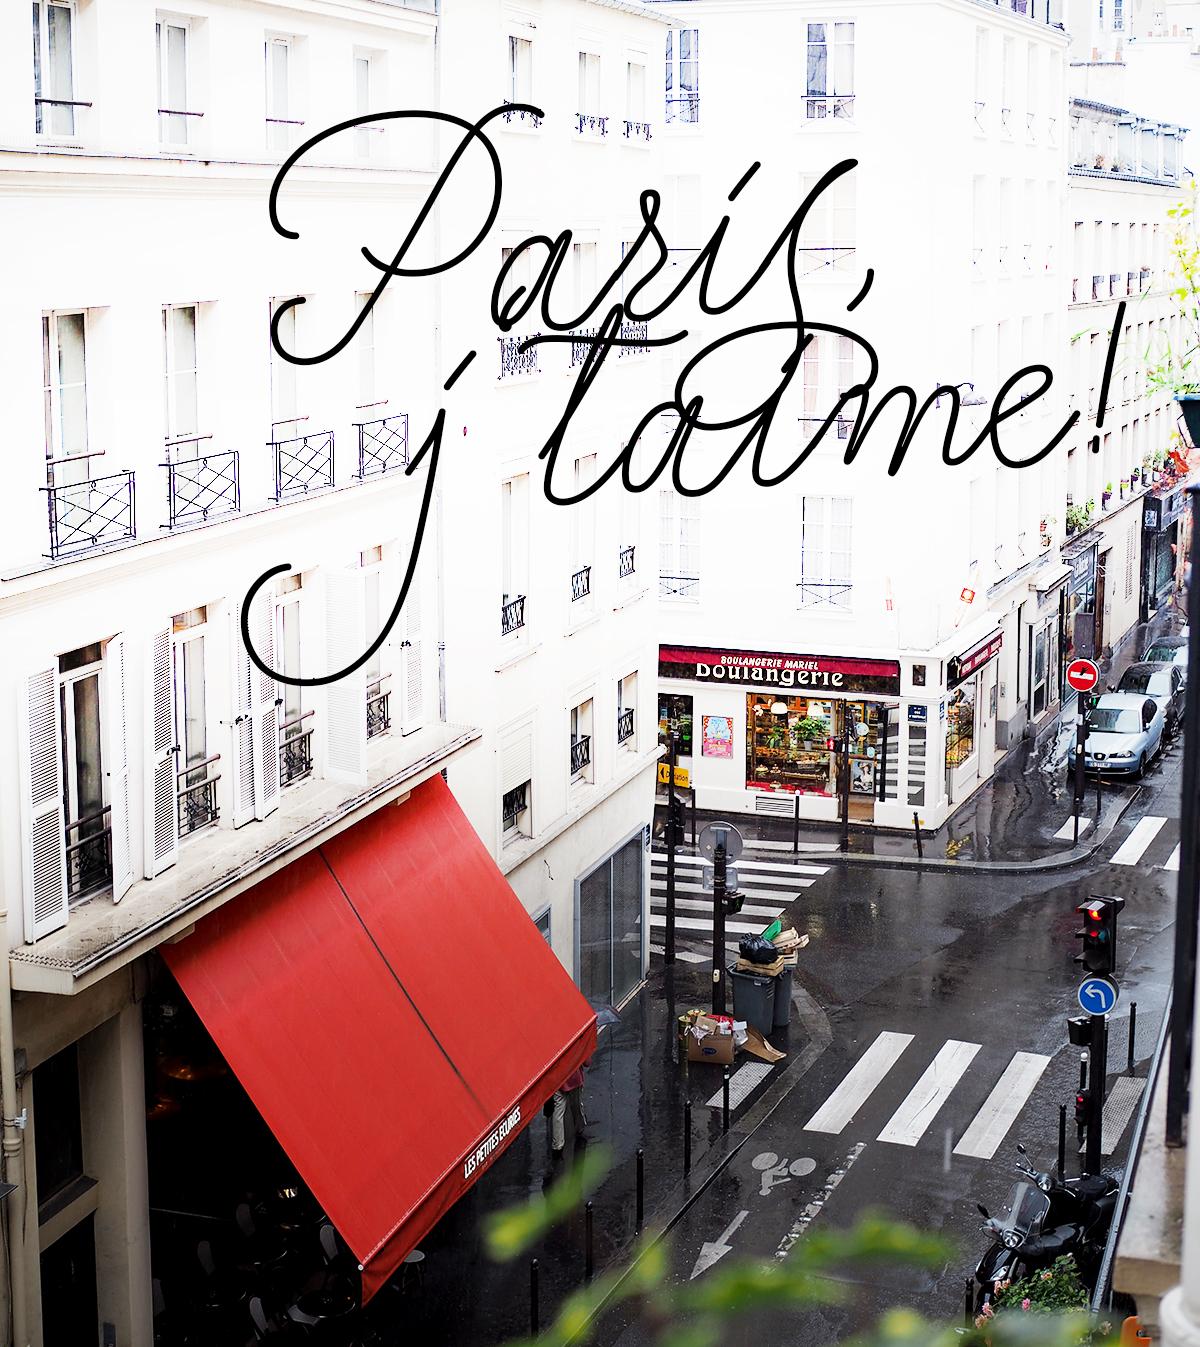 Foxycheeks Paris Travel / Foxycheeks